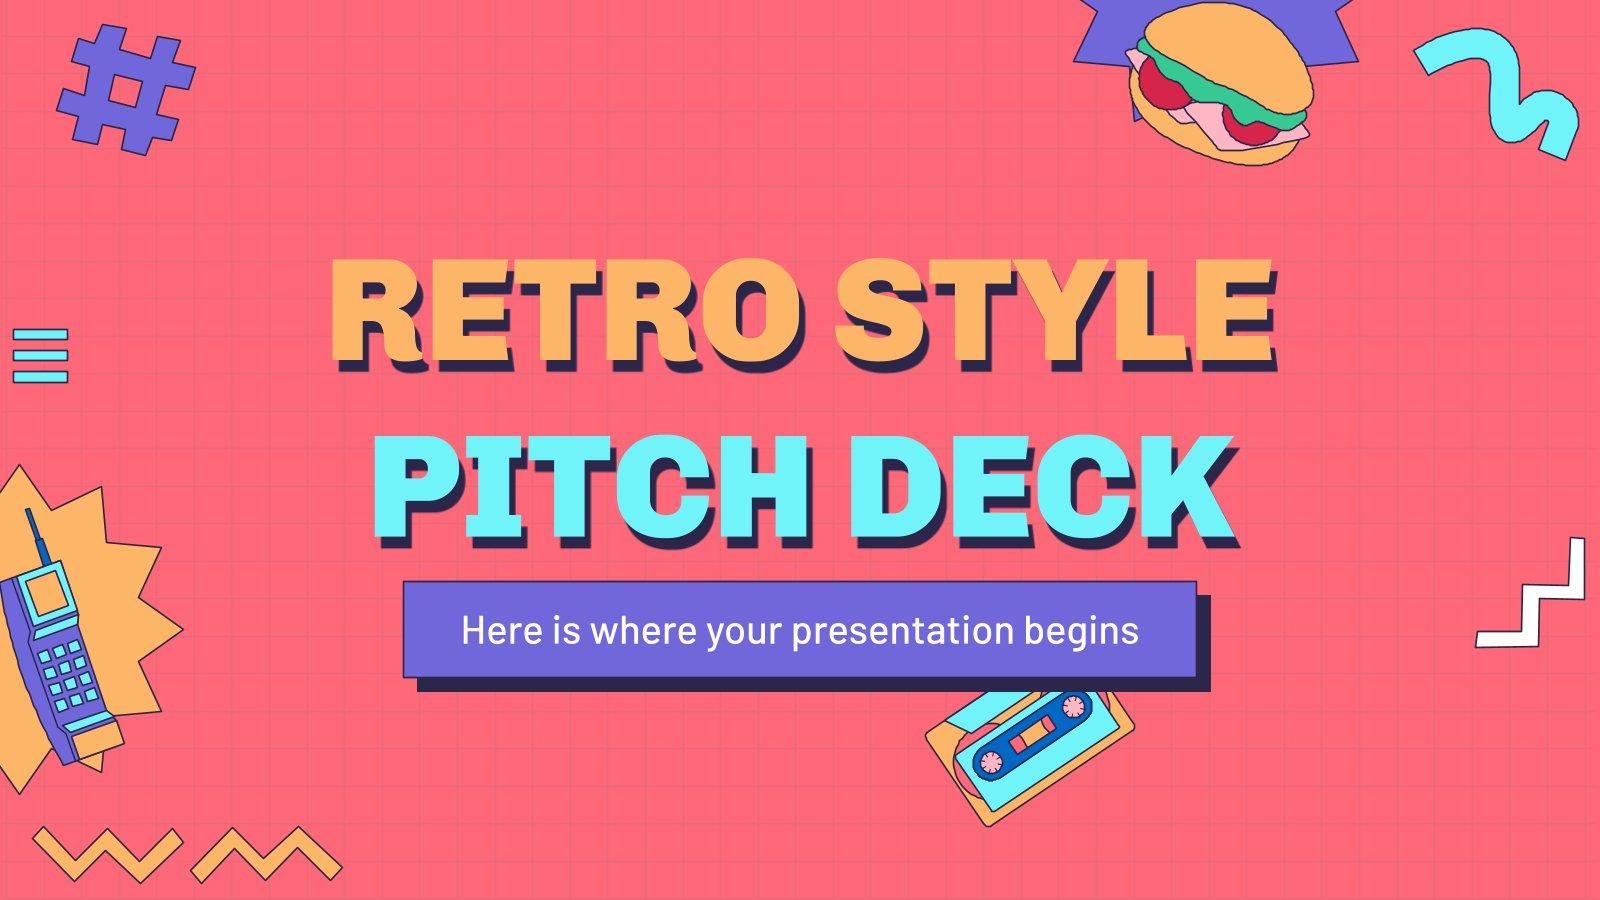 Retro Style Pitch Deck presentation template